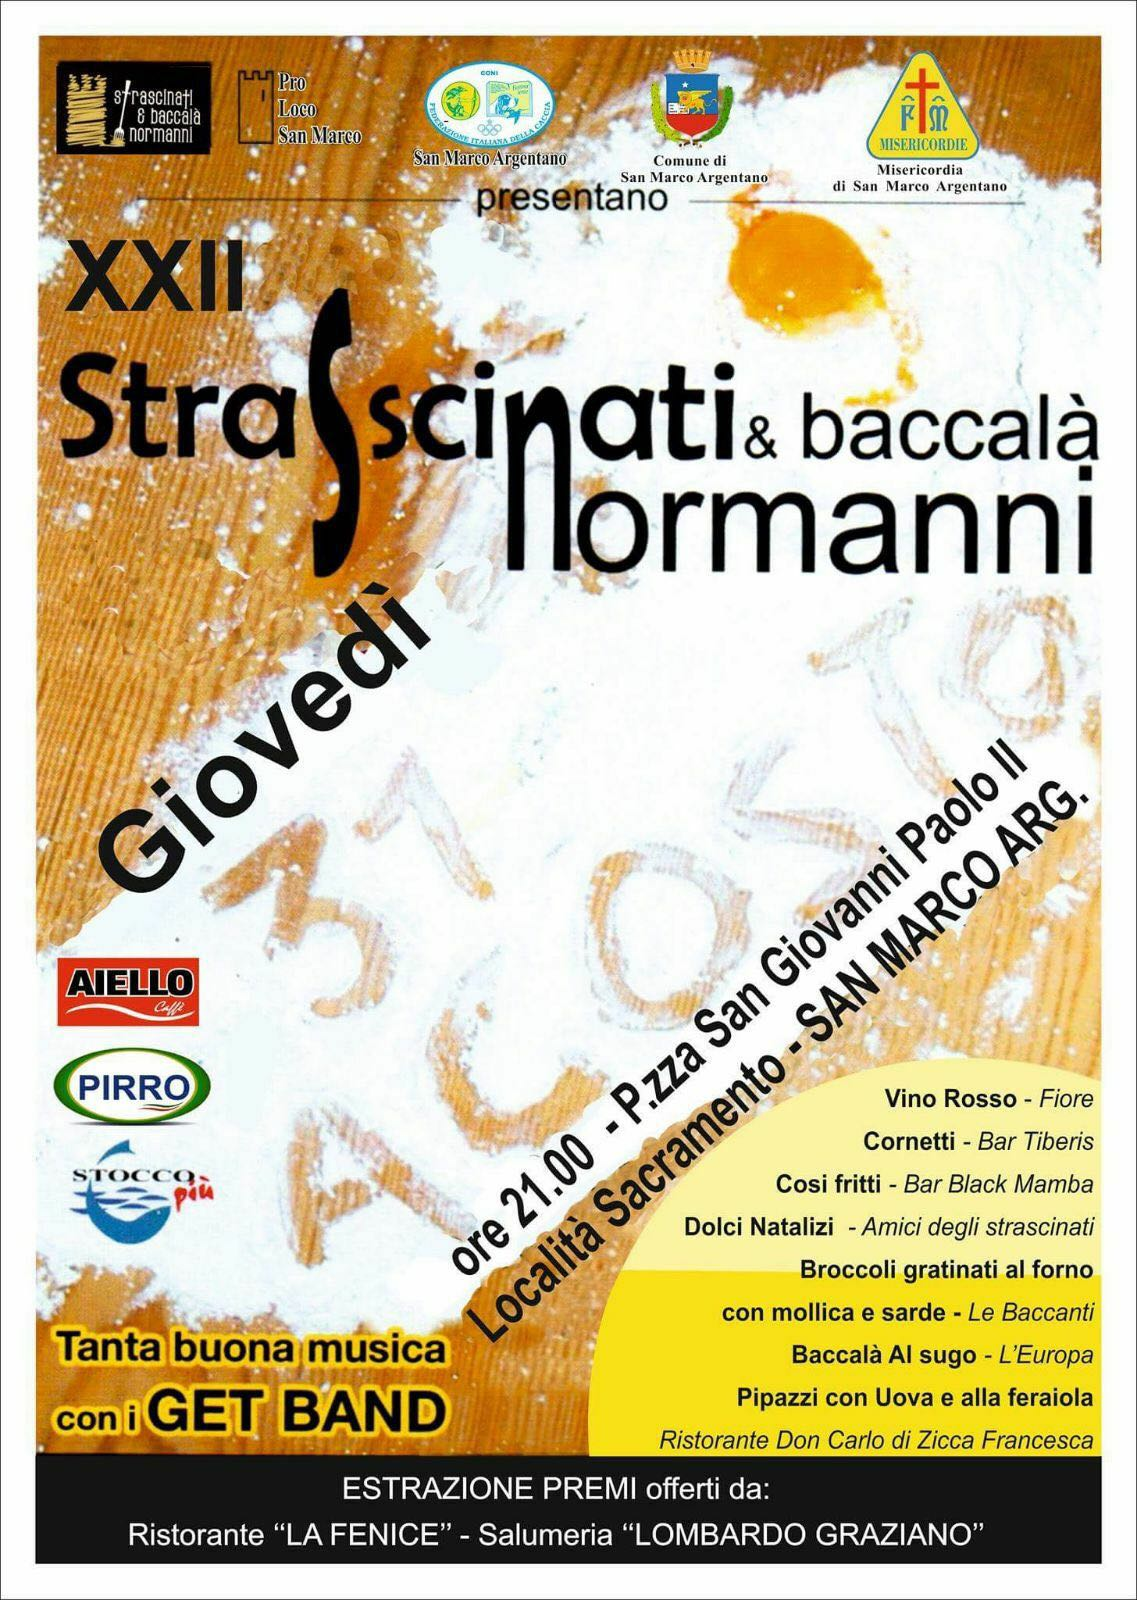 Strascinati Normanni & Baccalà